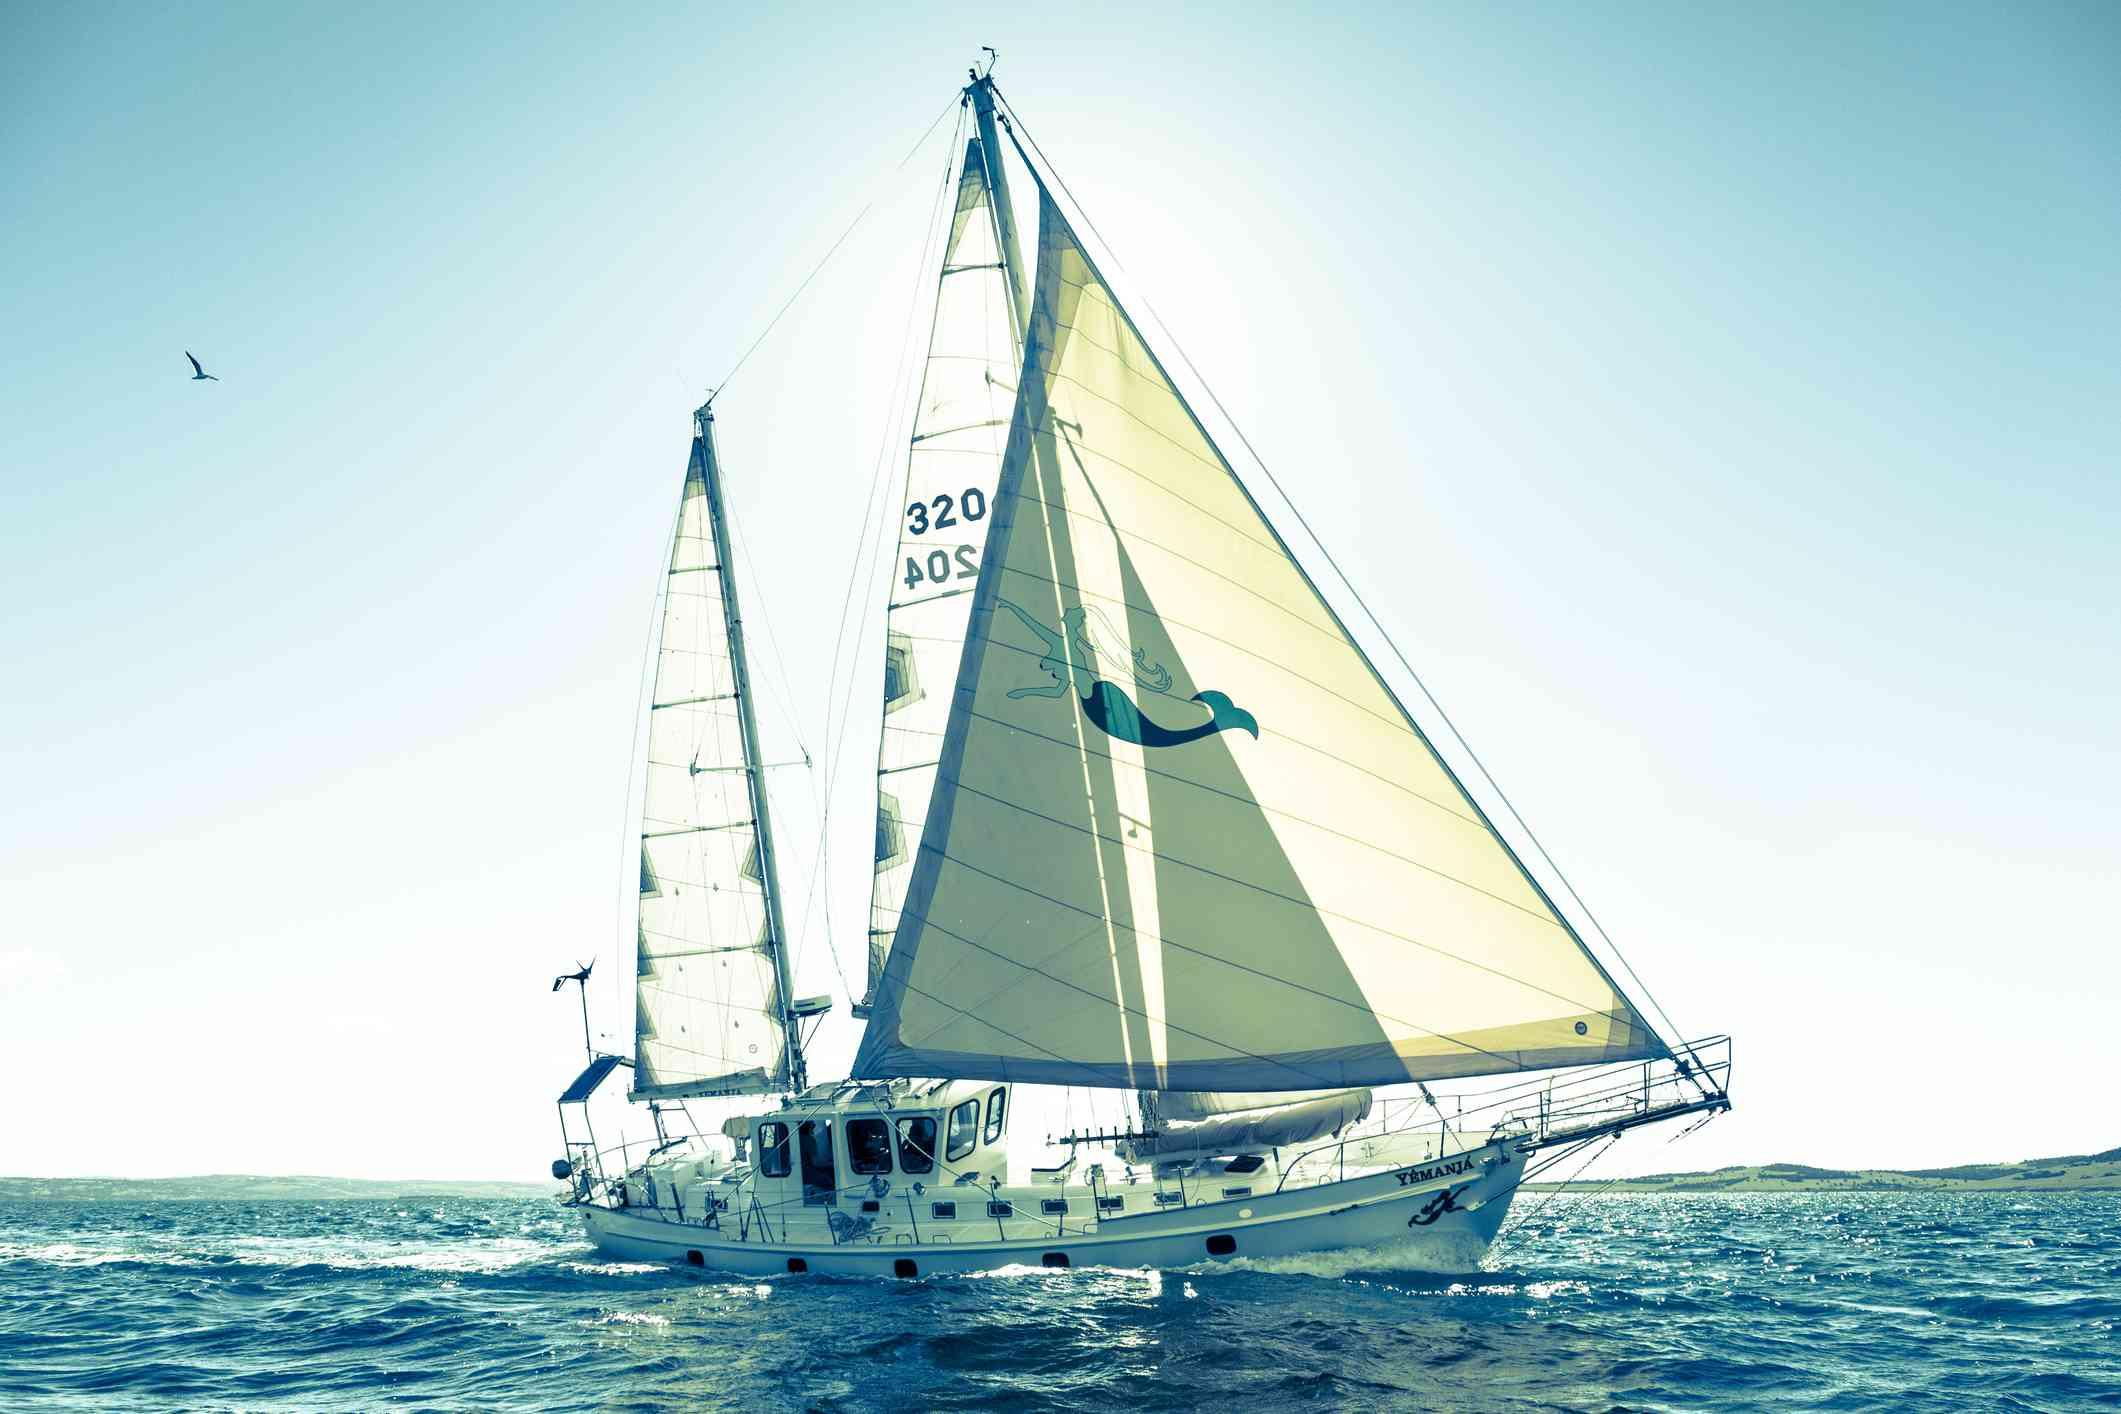 Ketch sailing in the ocean